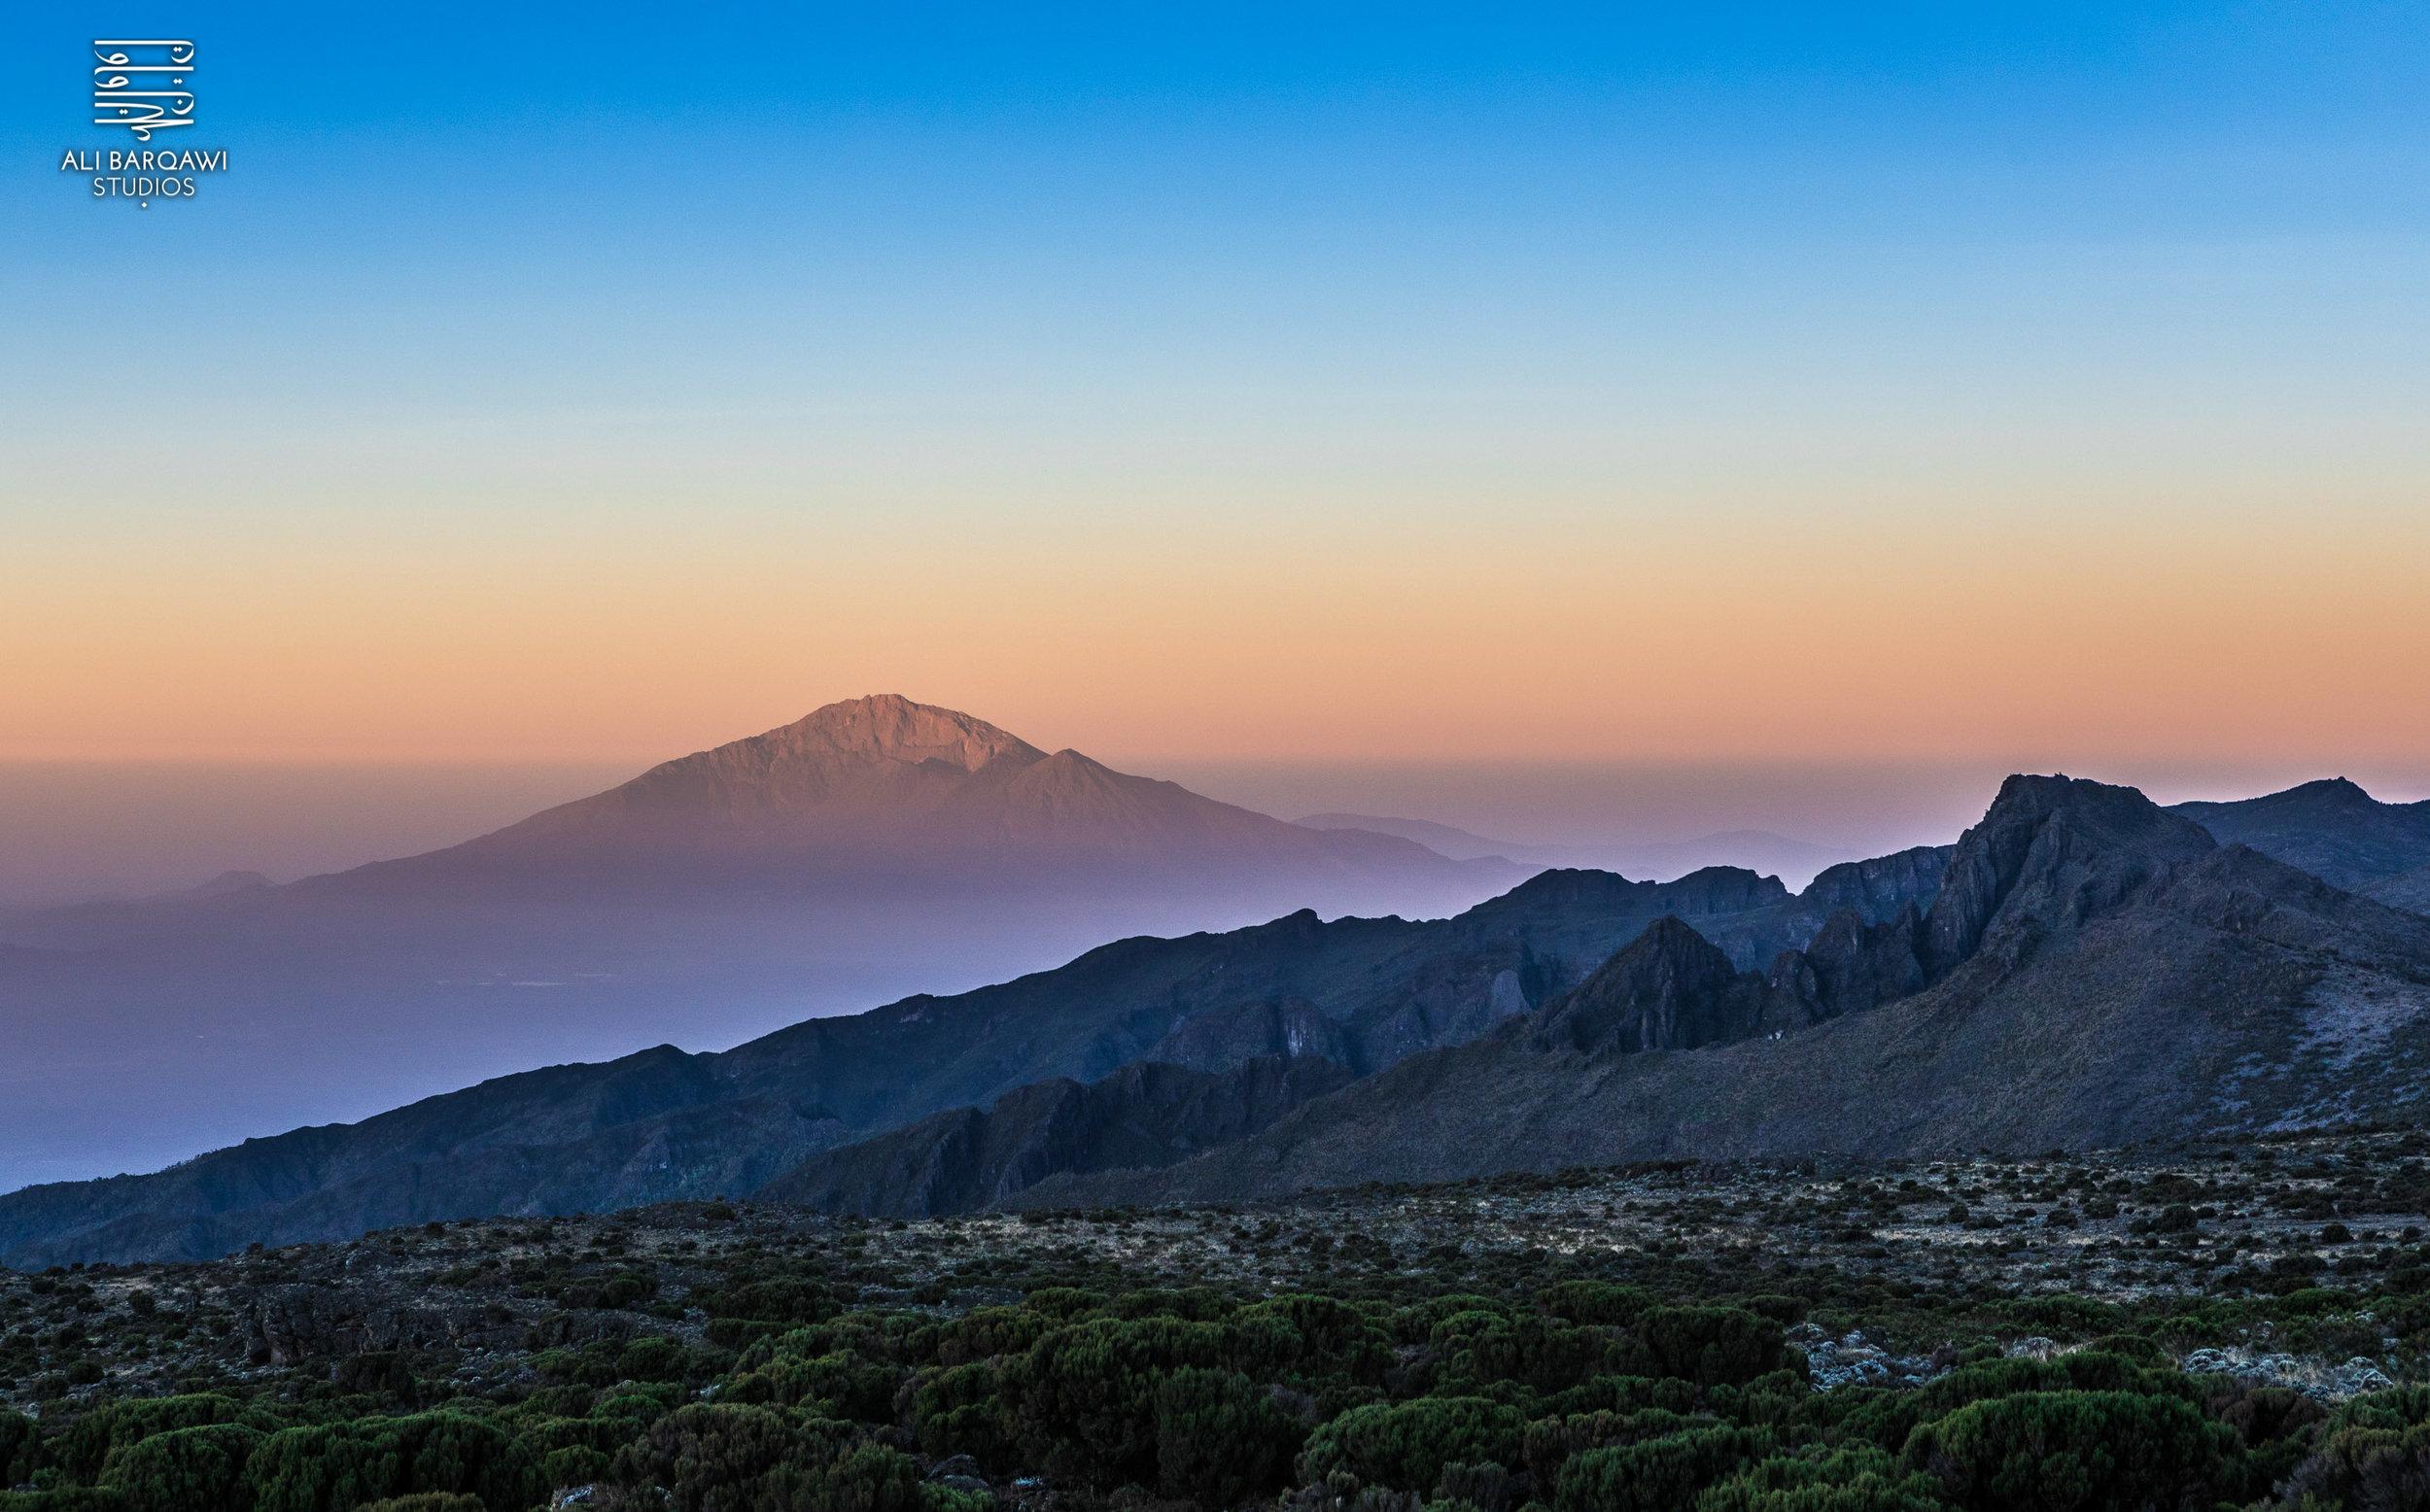 Ali-Barqawi-Studios-Explore-Series-Travel-Adventure-Documentary-Climb4Karam-Kilimanjaro-Tanzania-2017-012.jpg